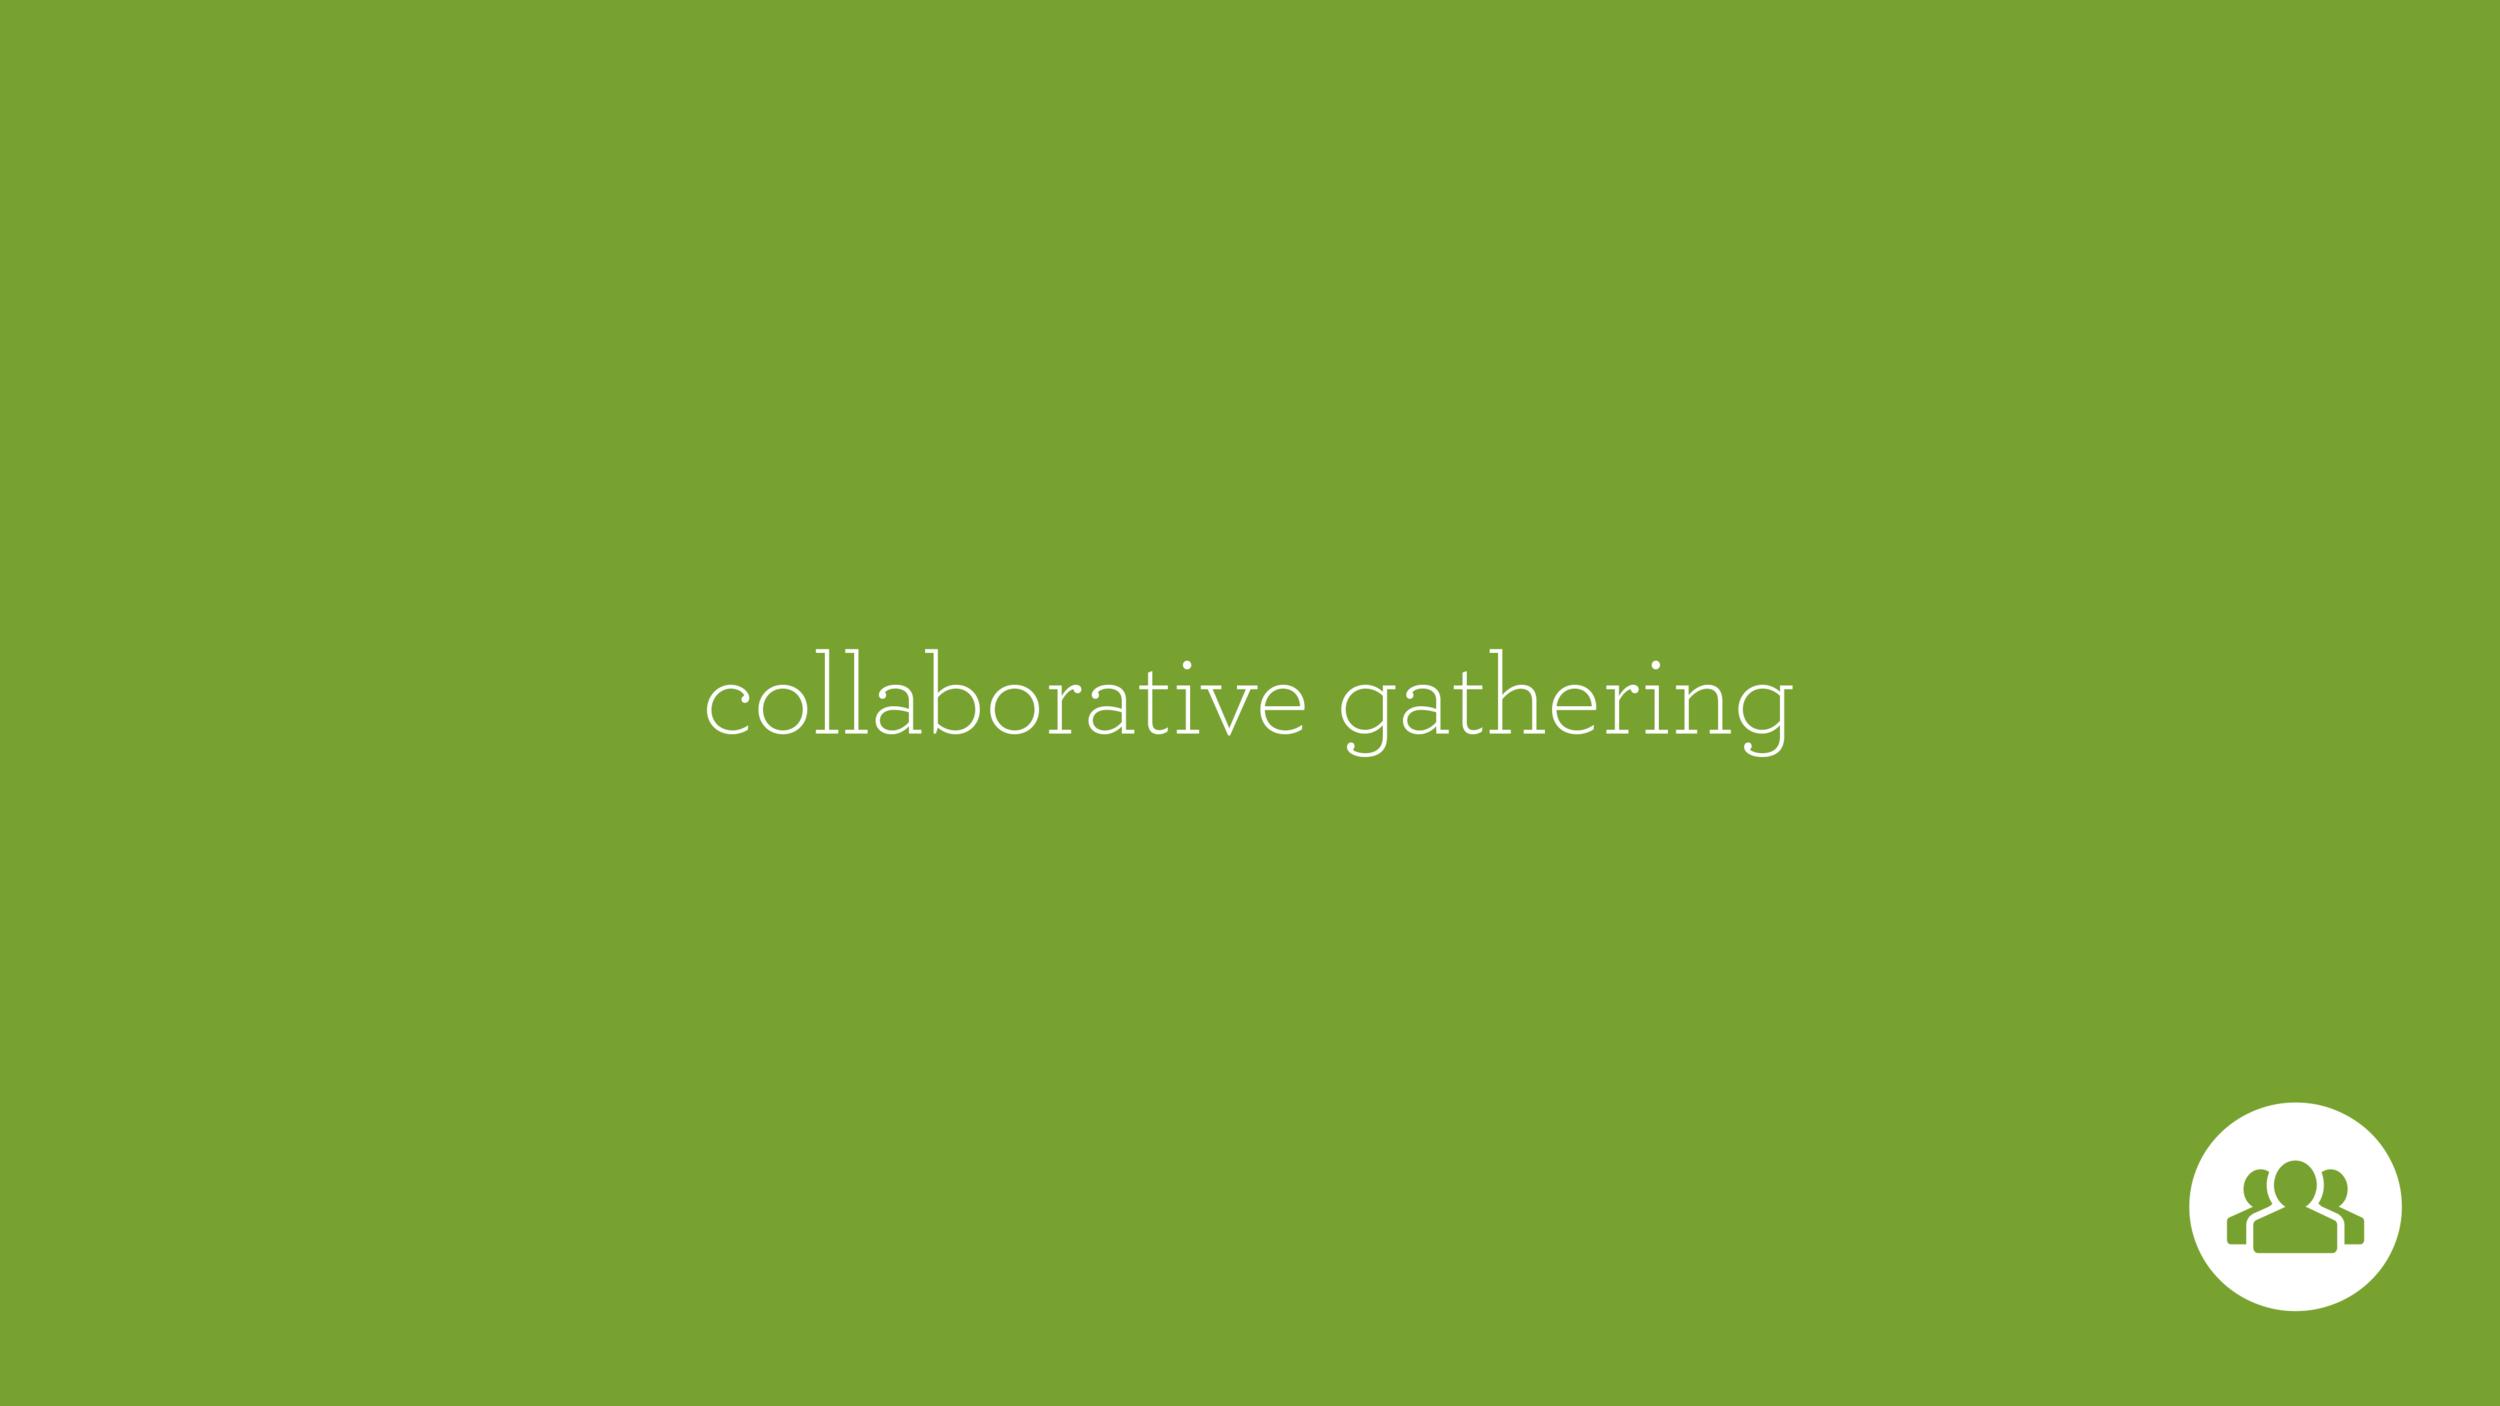 MCLeaderCollaborativeGathering.png